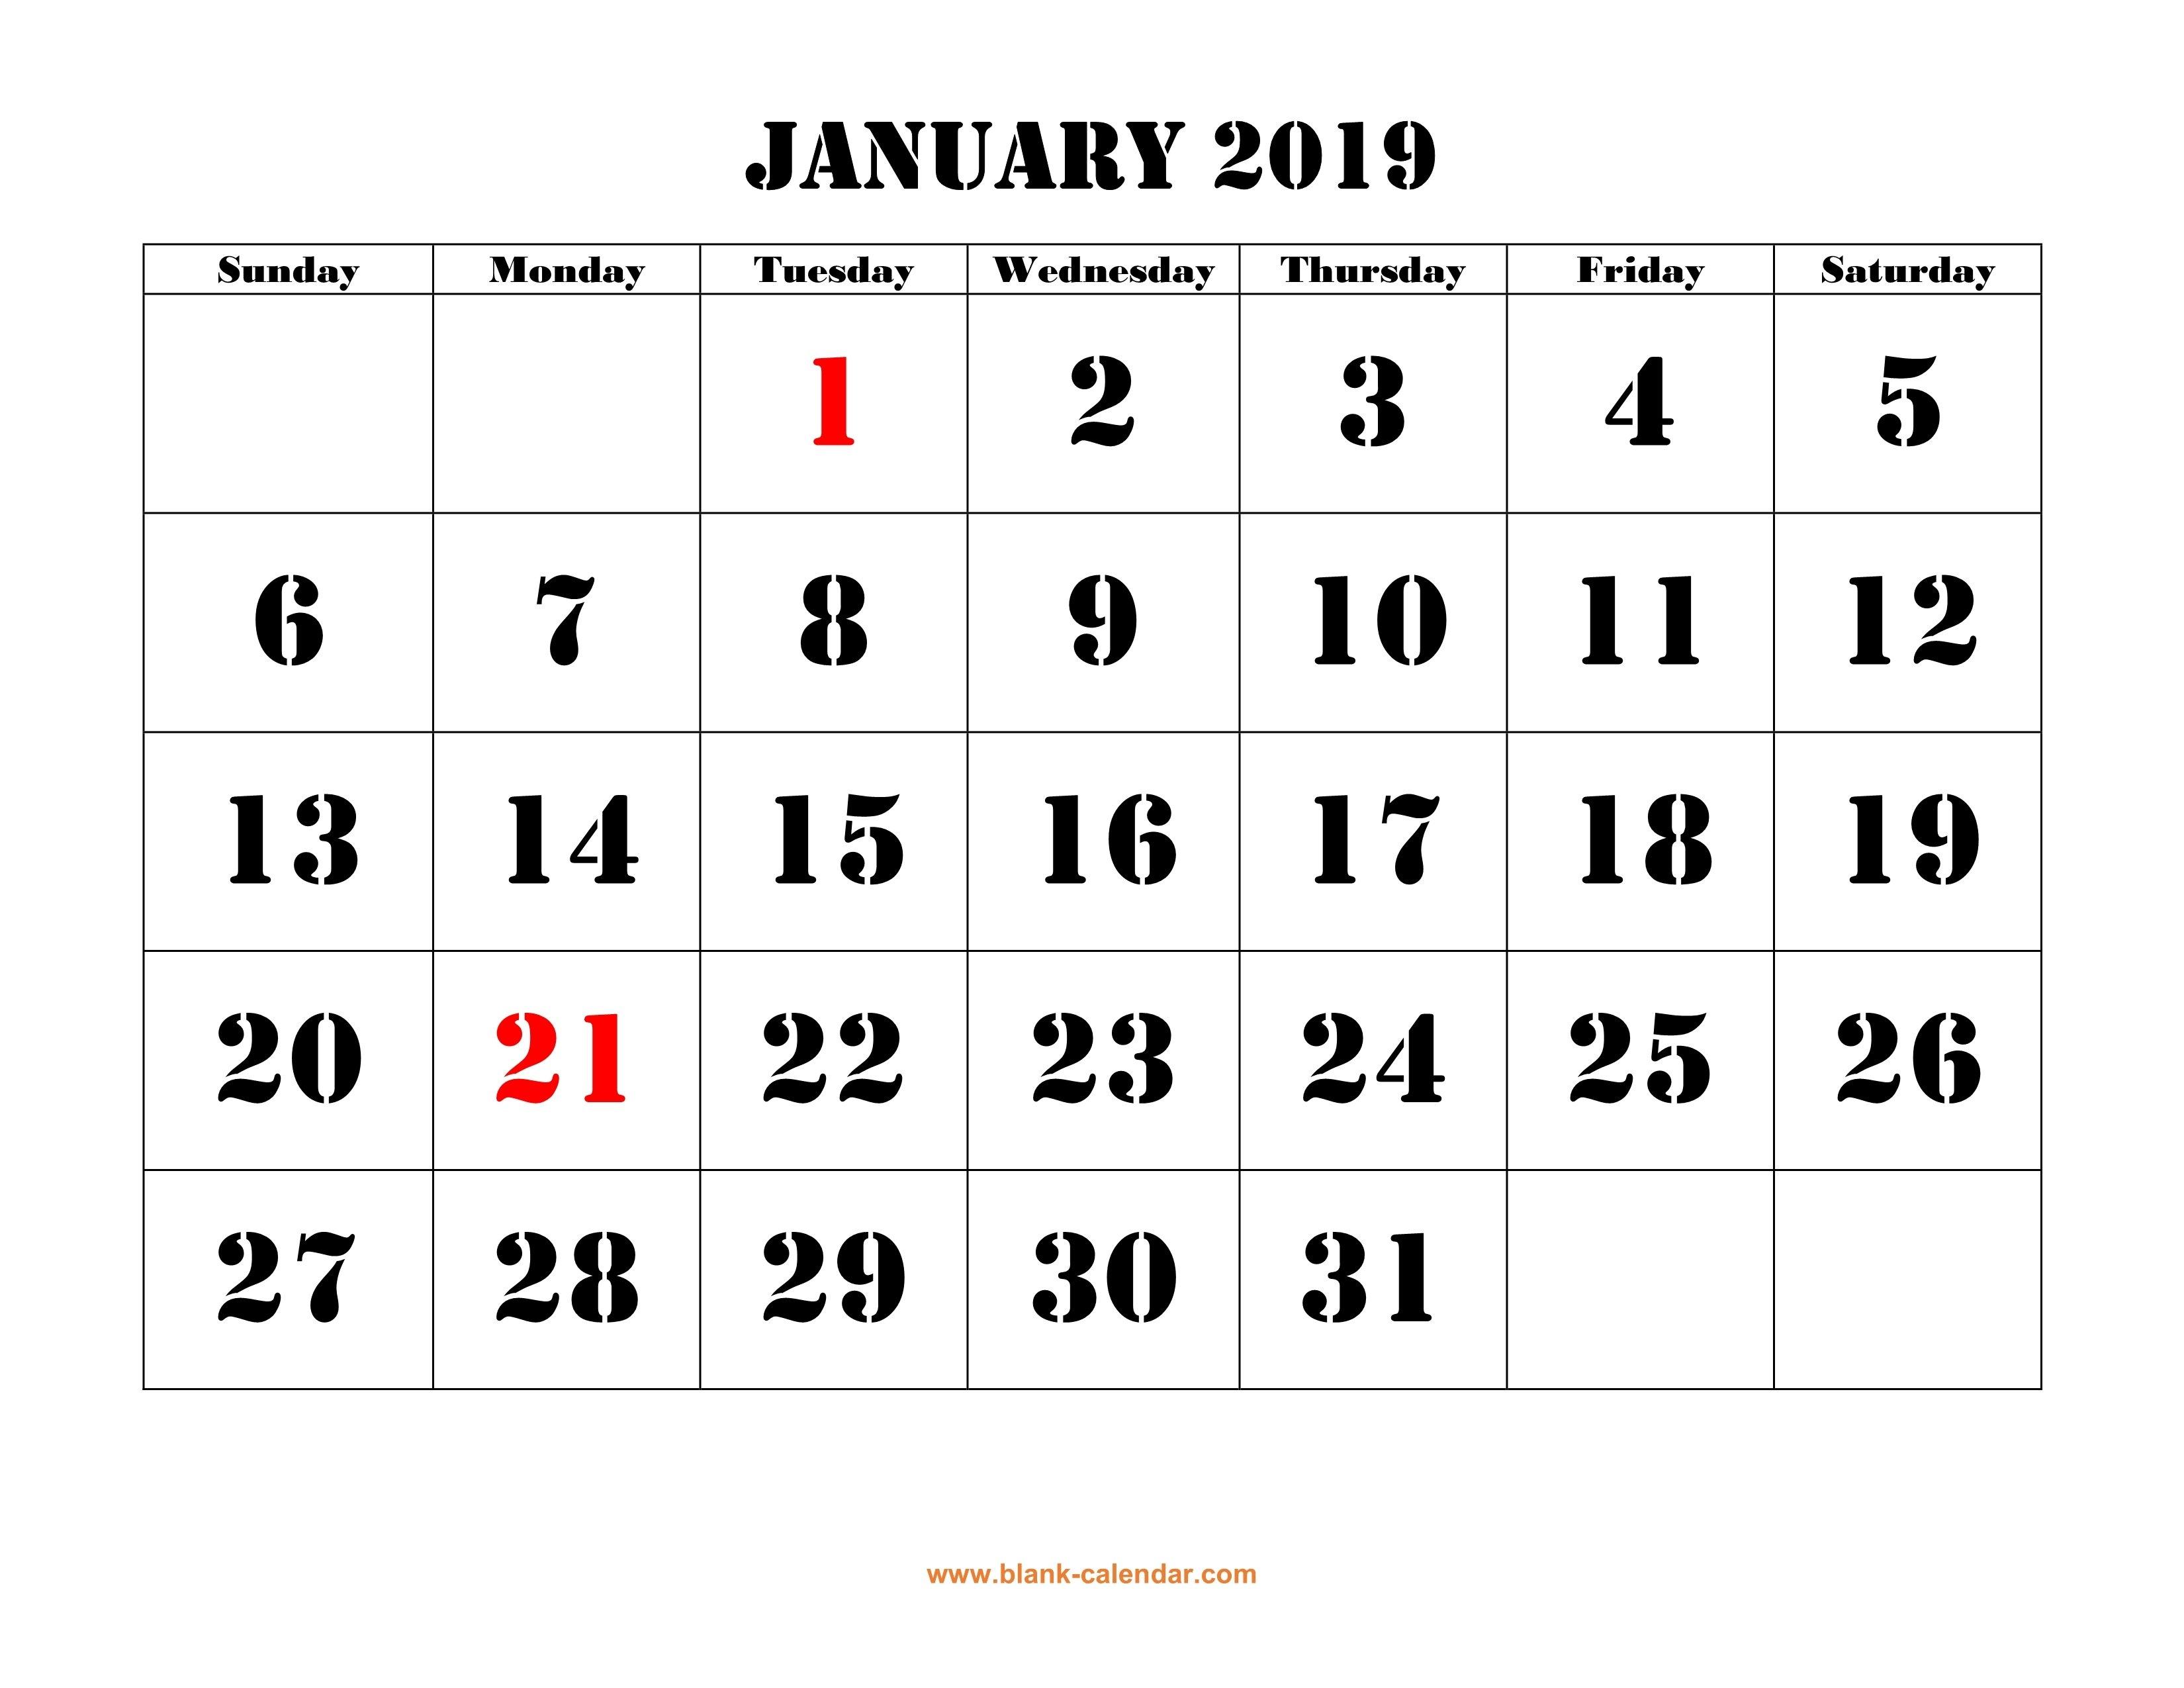 Free Download Printable January 2019 Calendar, Large Font Design Calendar Of 2019